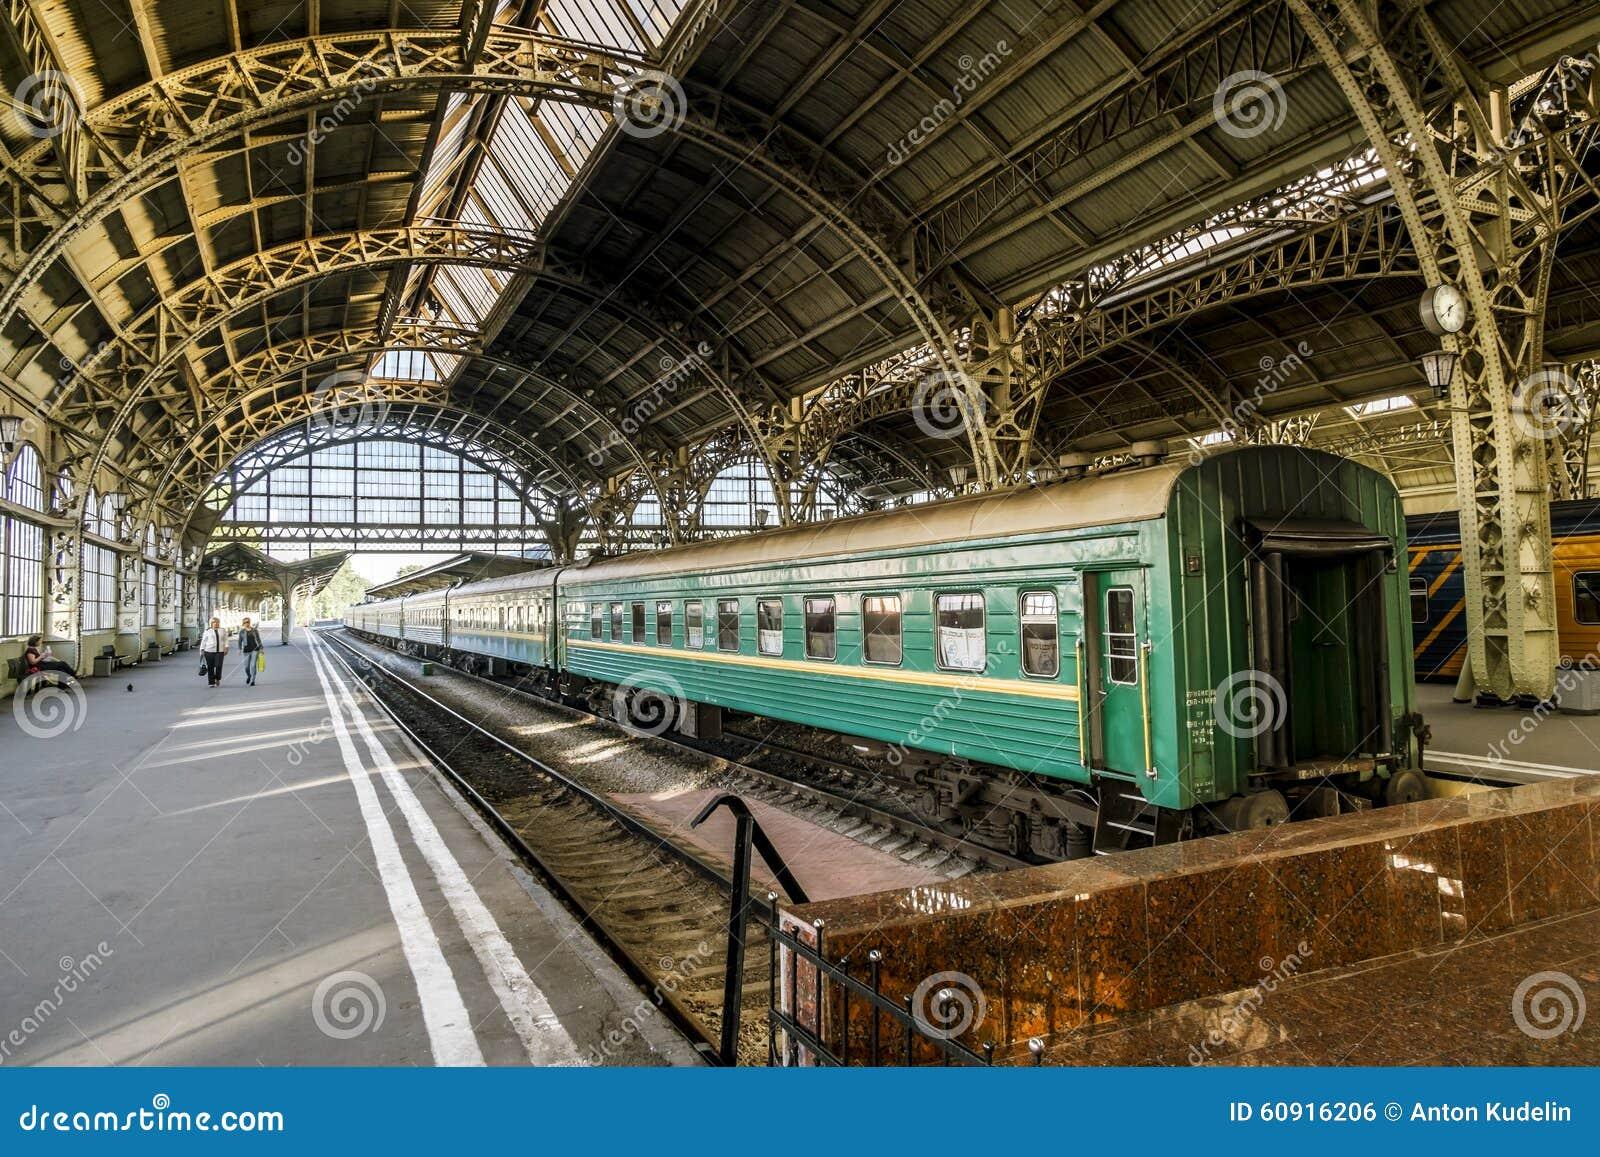 Such a unique and unique Vitebsk railway station